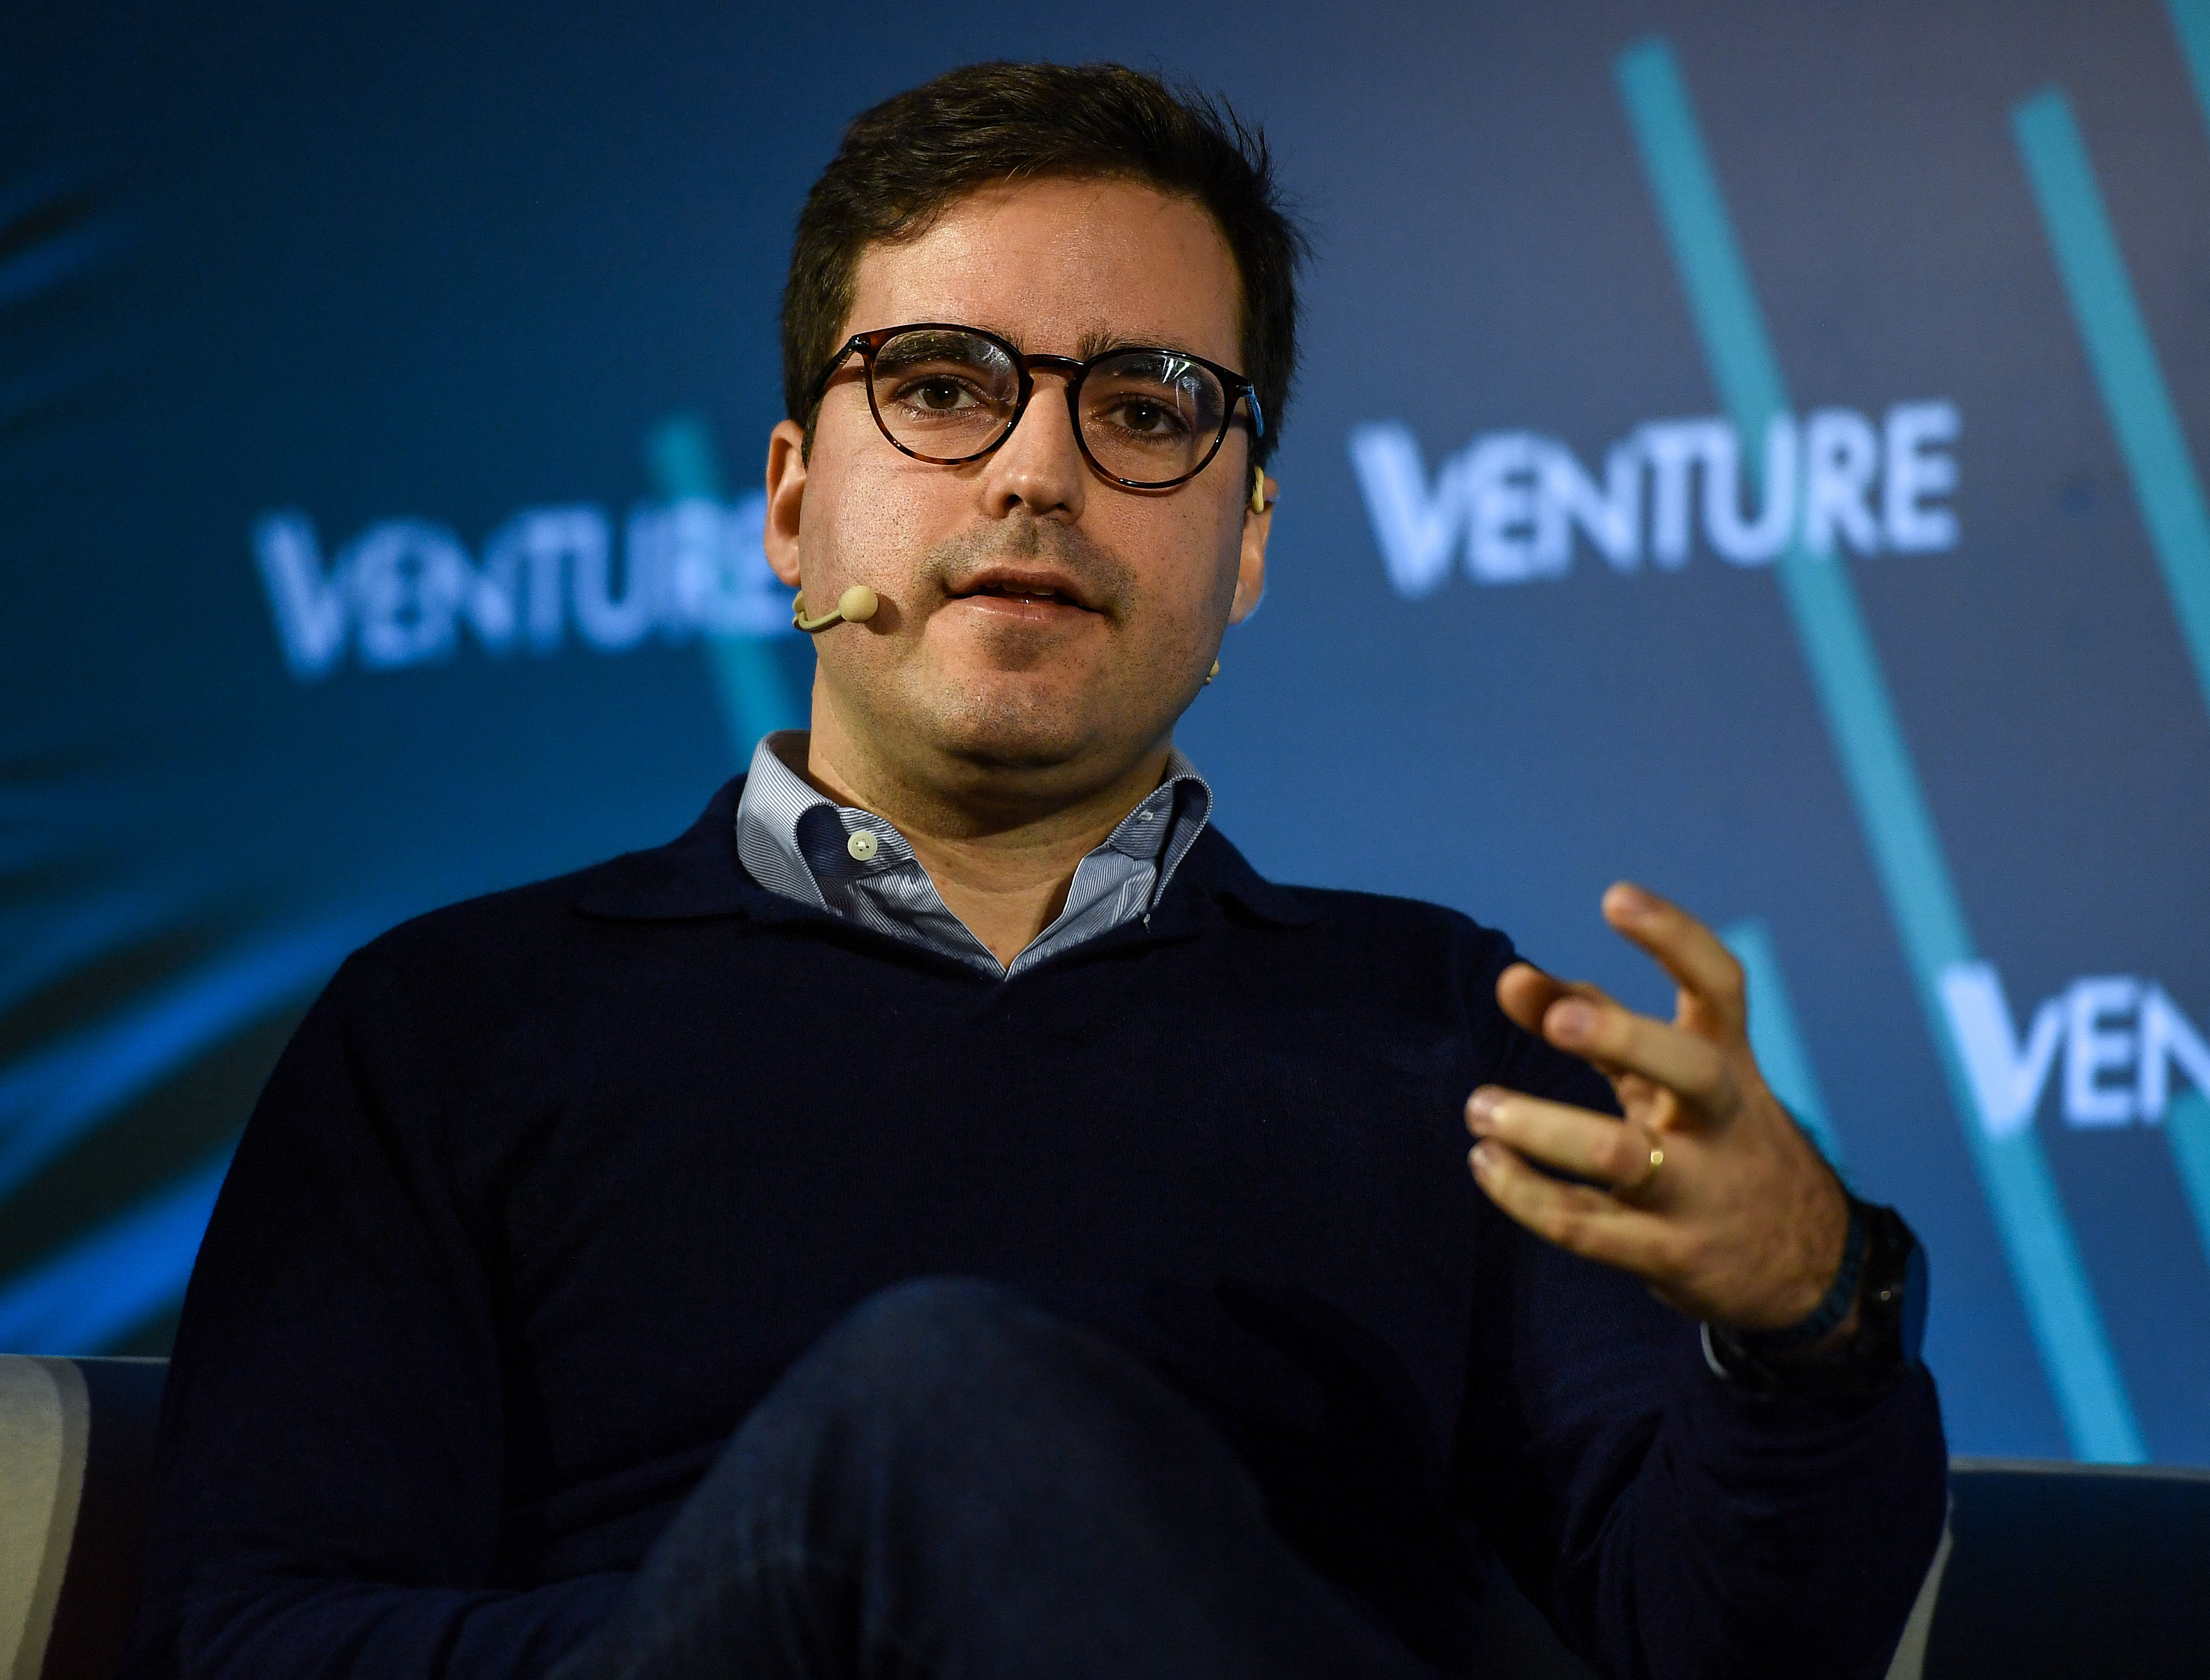 2019 - Venture - Day 1 HM1 7304 (49012438101).jpg 4 November 2019; Nicholas Stocks, White Star Capital on Ventrue Stage at Venture in Convento do